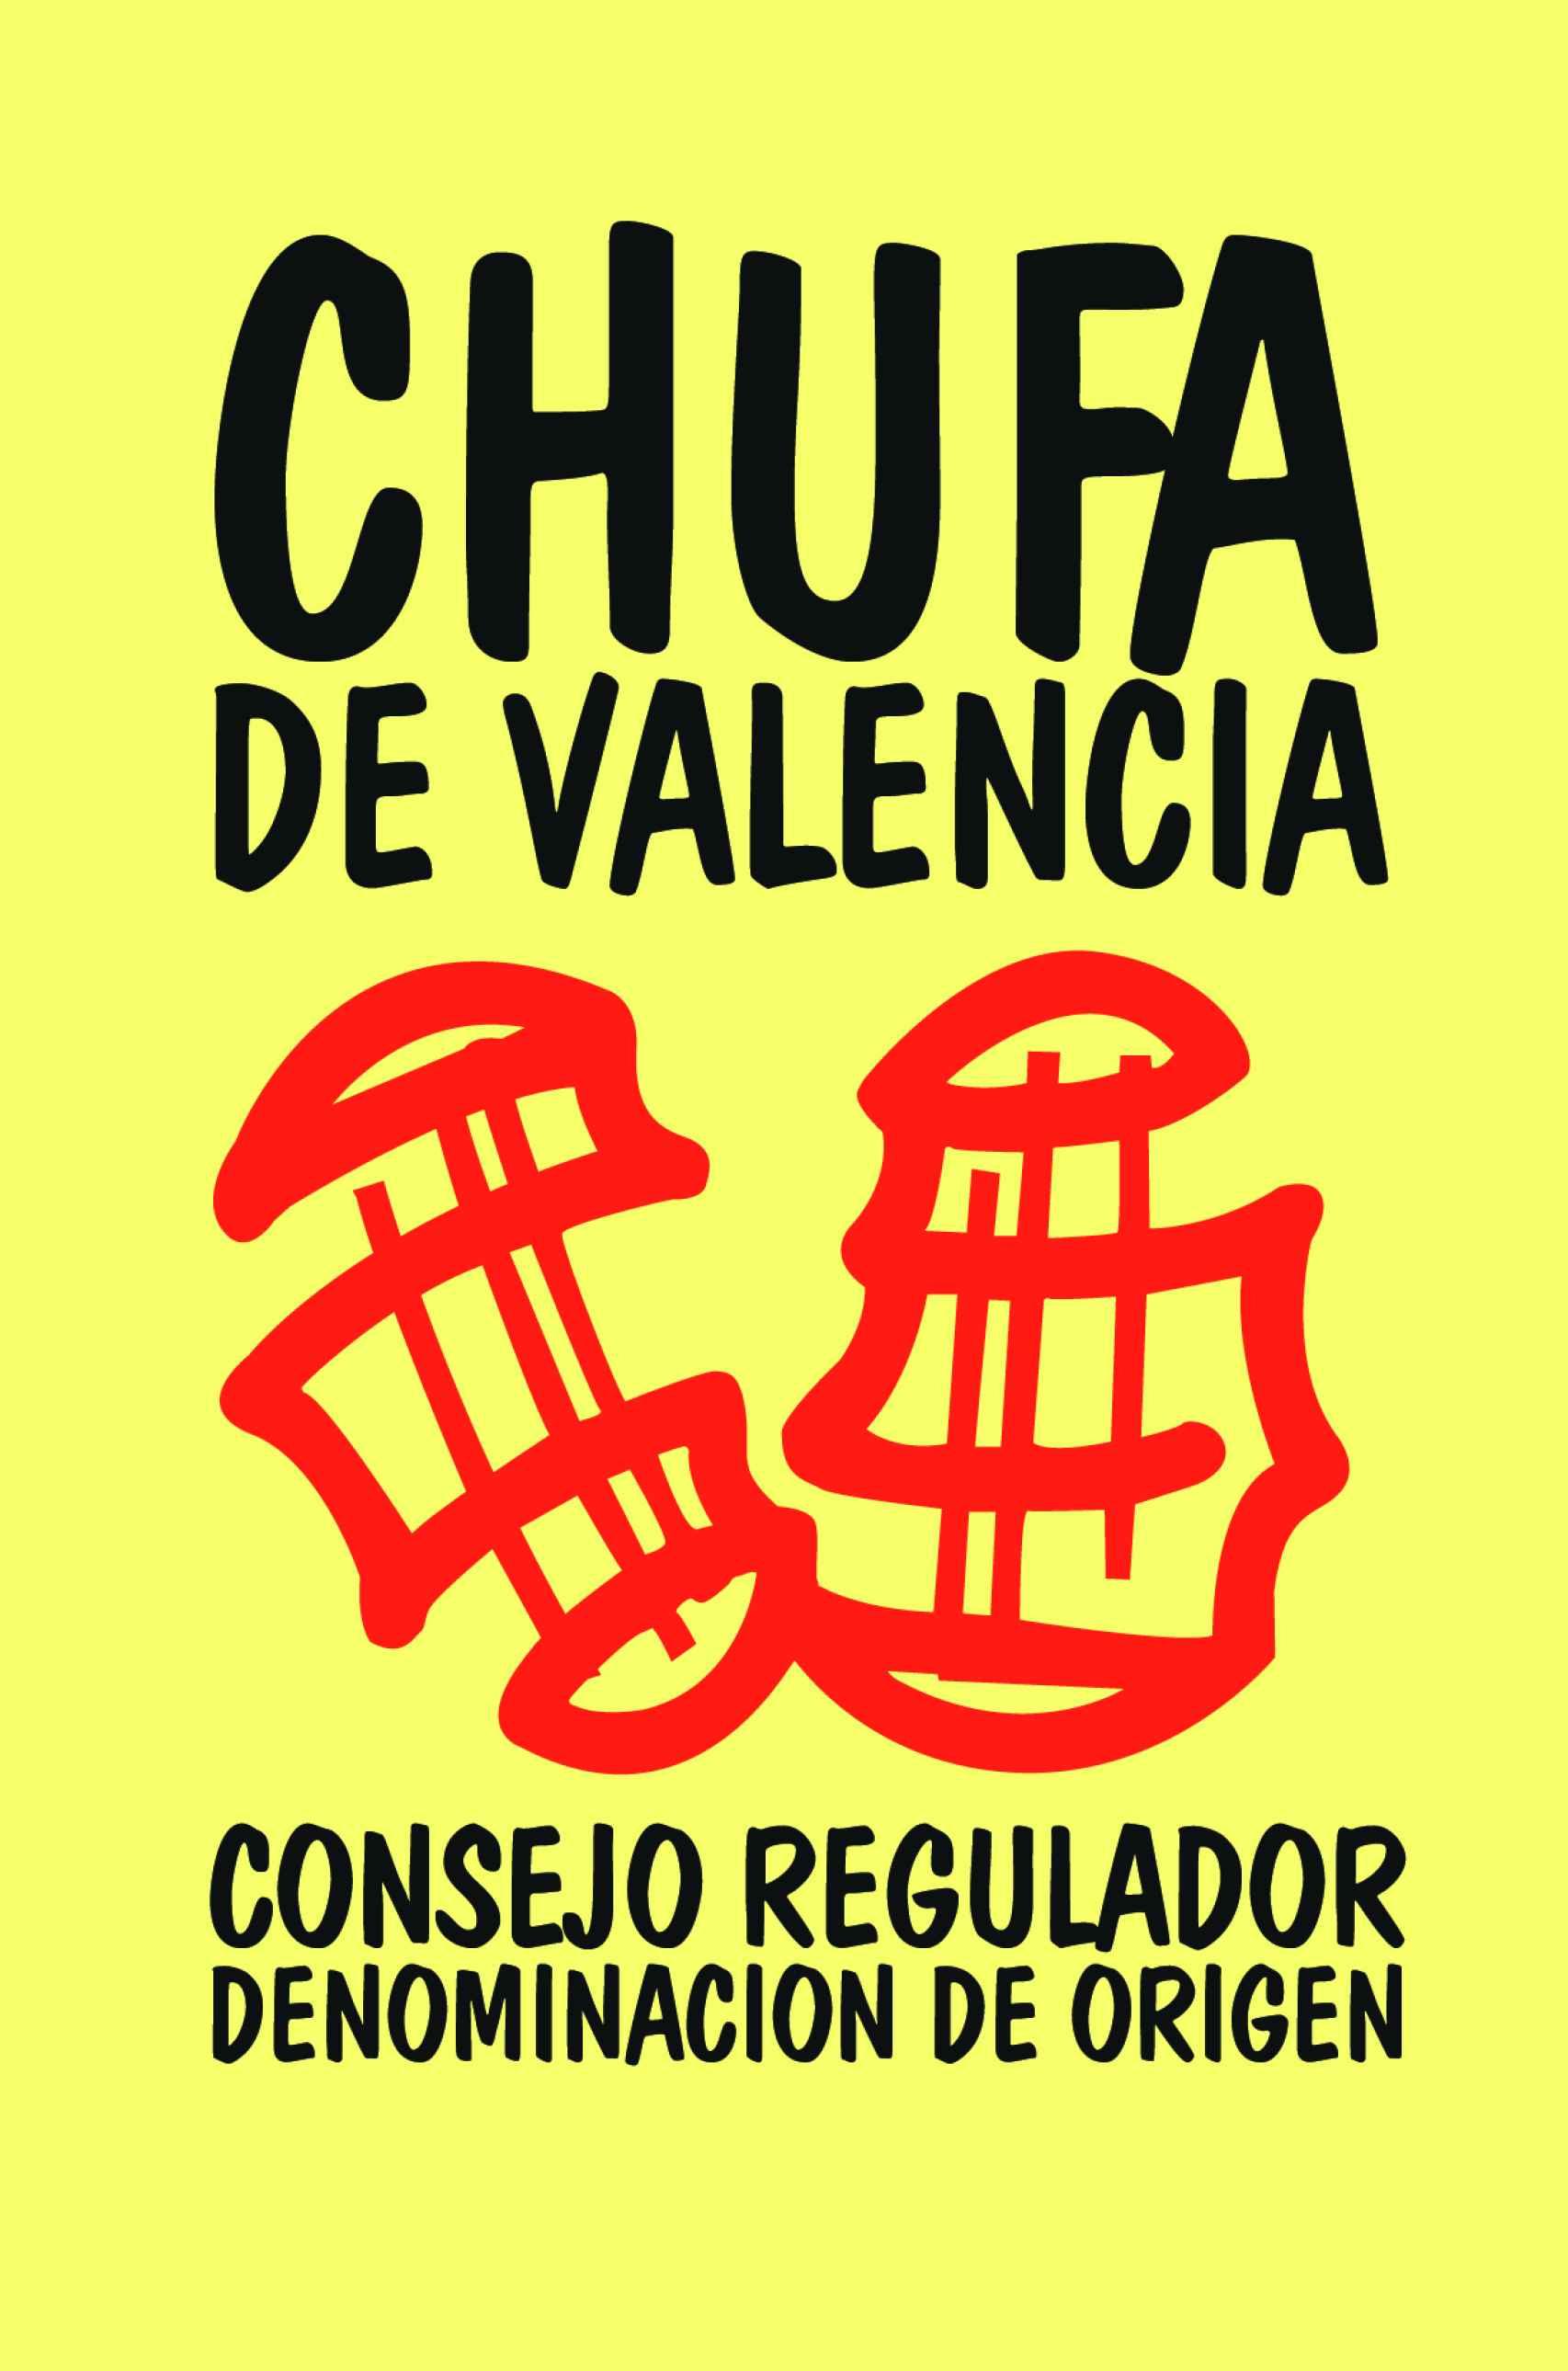 Sello Denominación de Origen Chufa de Valencia.